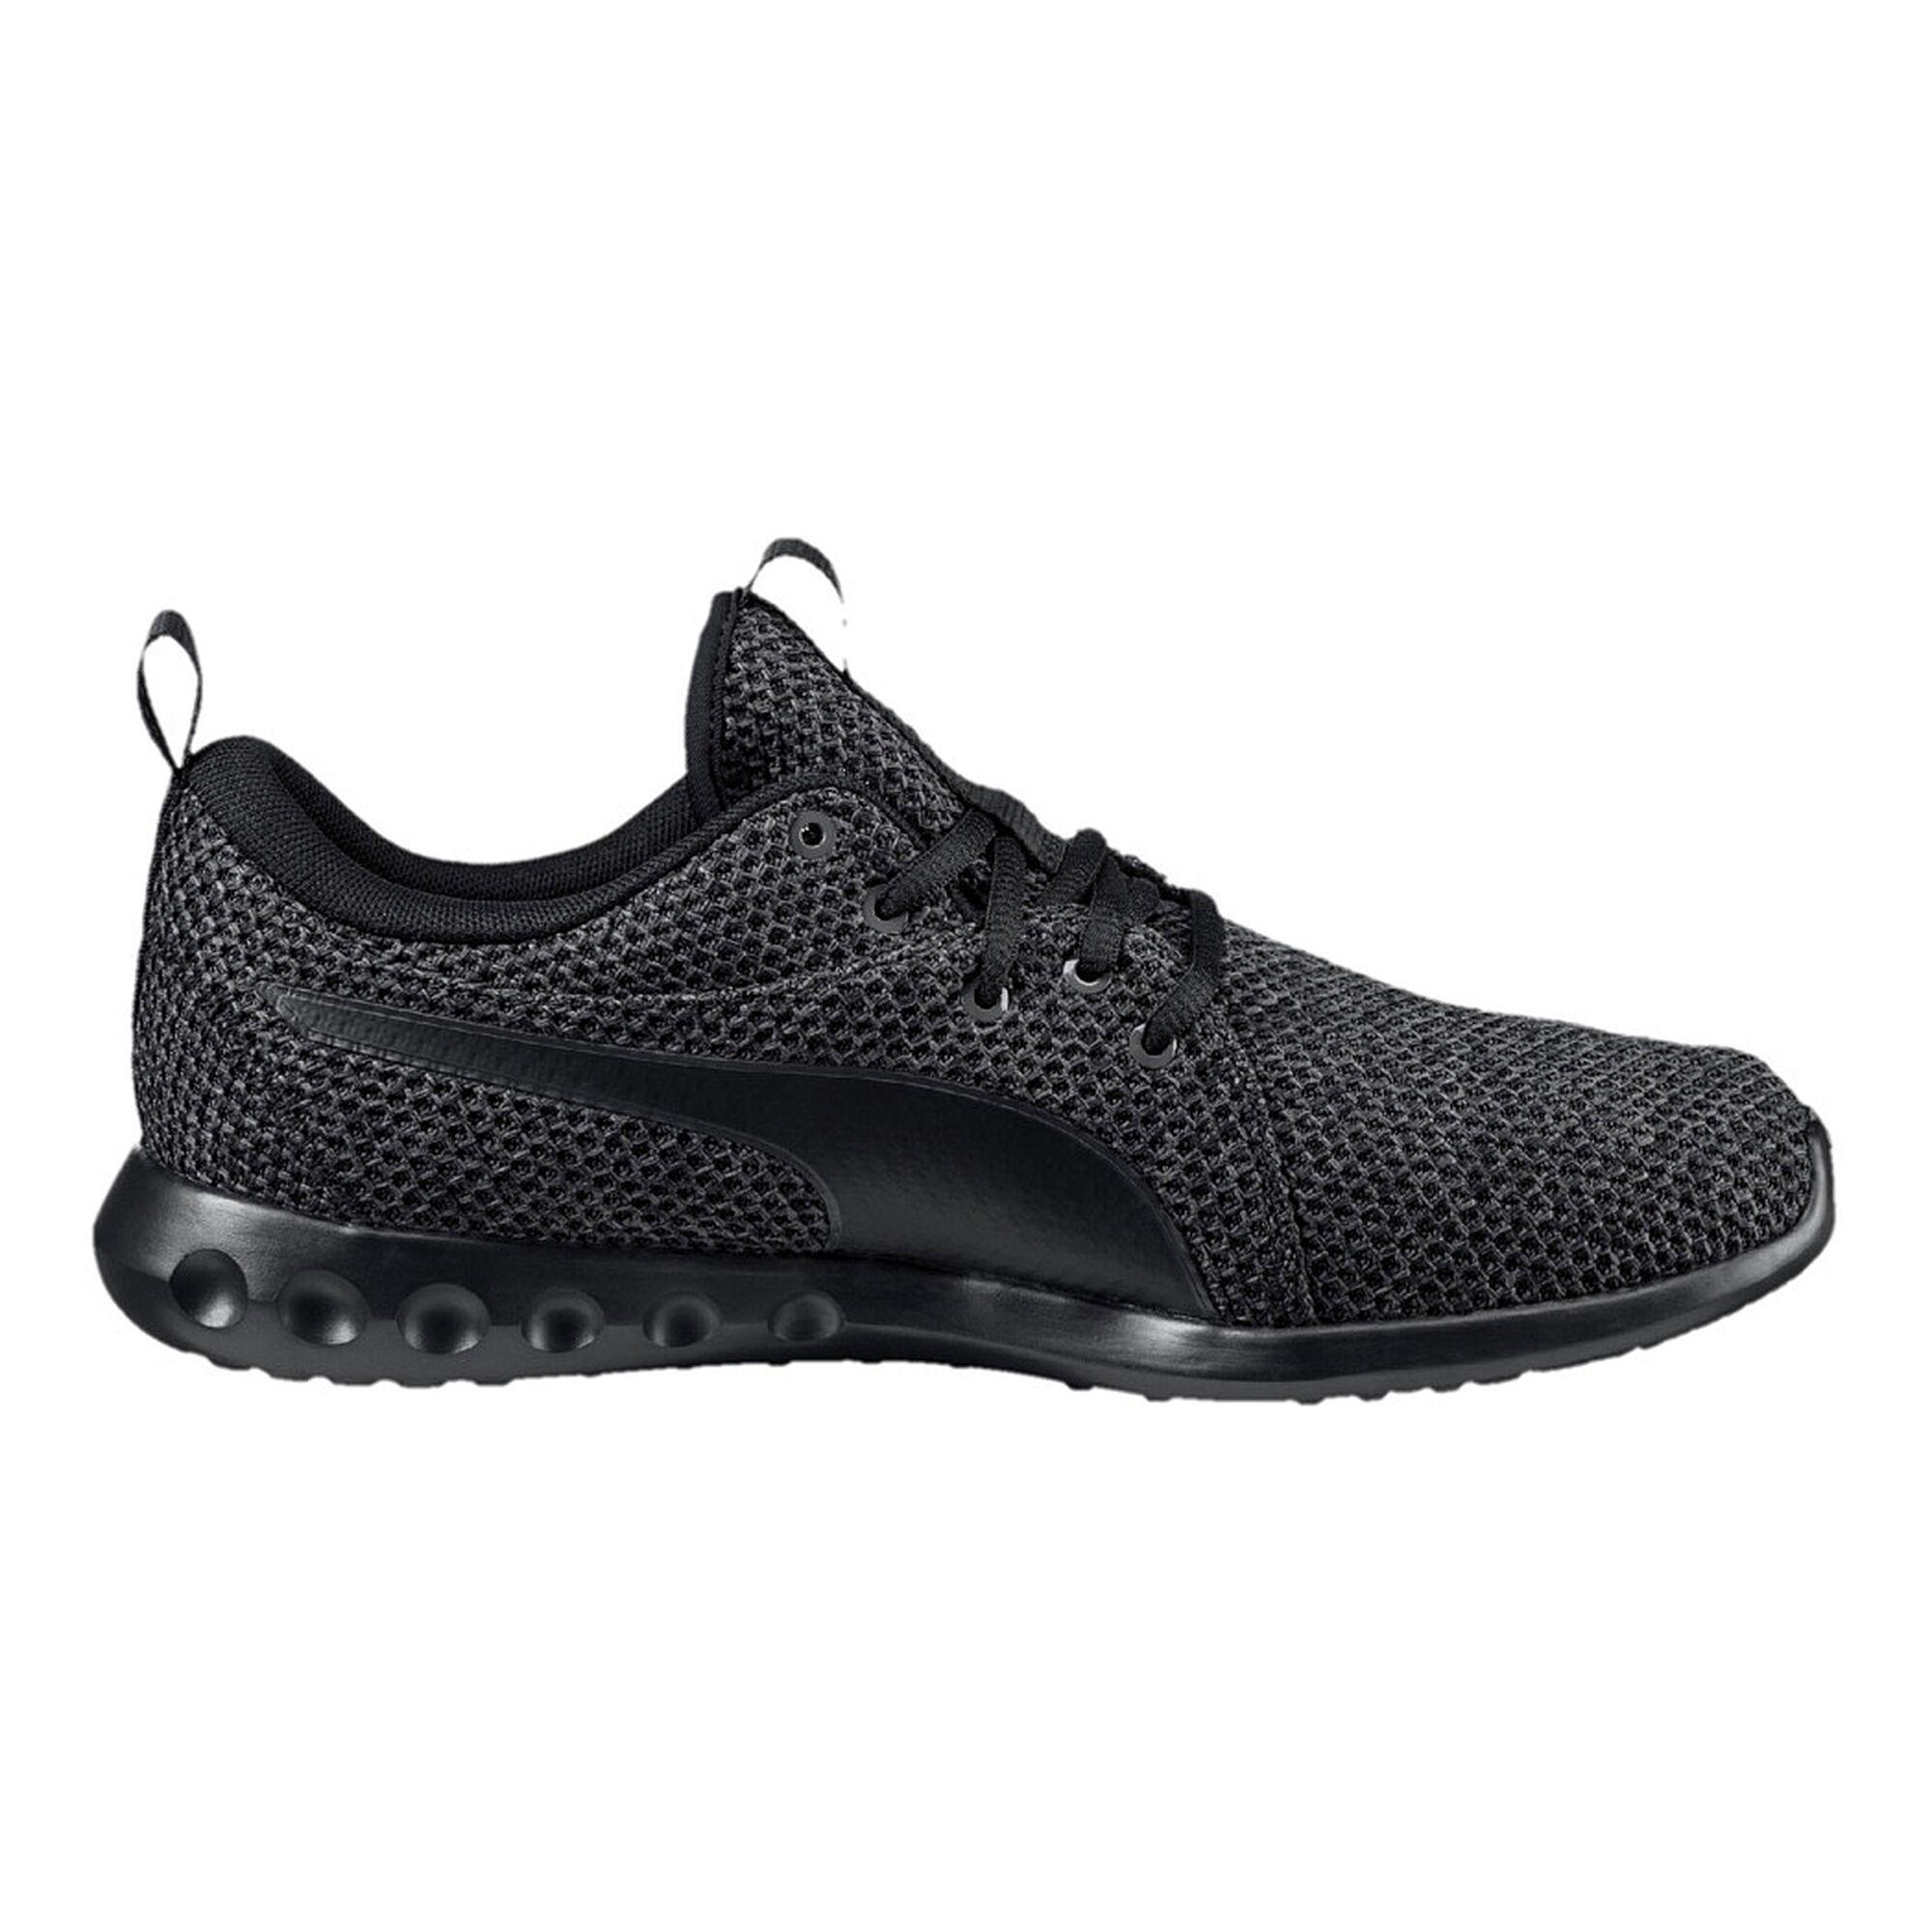 ade8143a4d3 buy Puma Carson 2 Nature Knit Neutral Running Shoe Men - Dark Grey ...